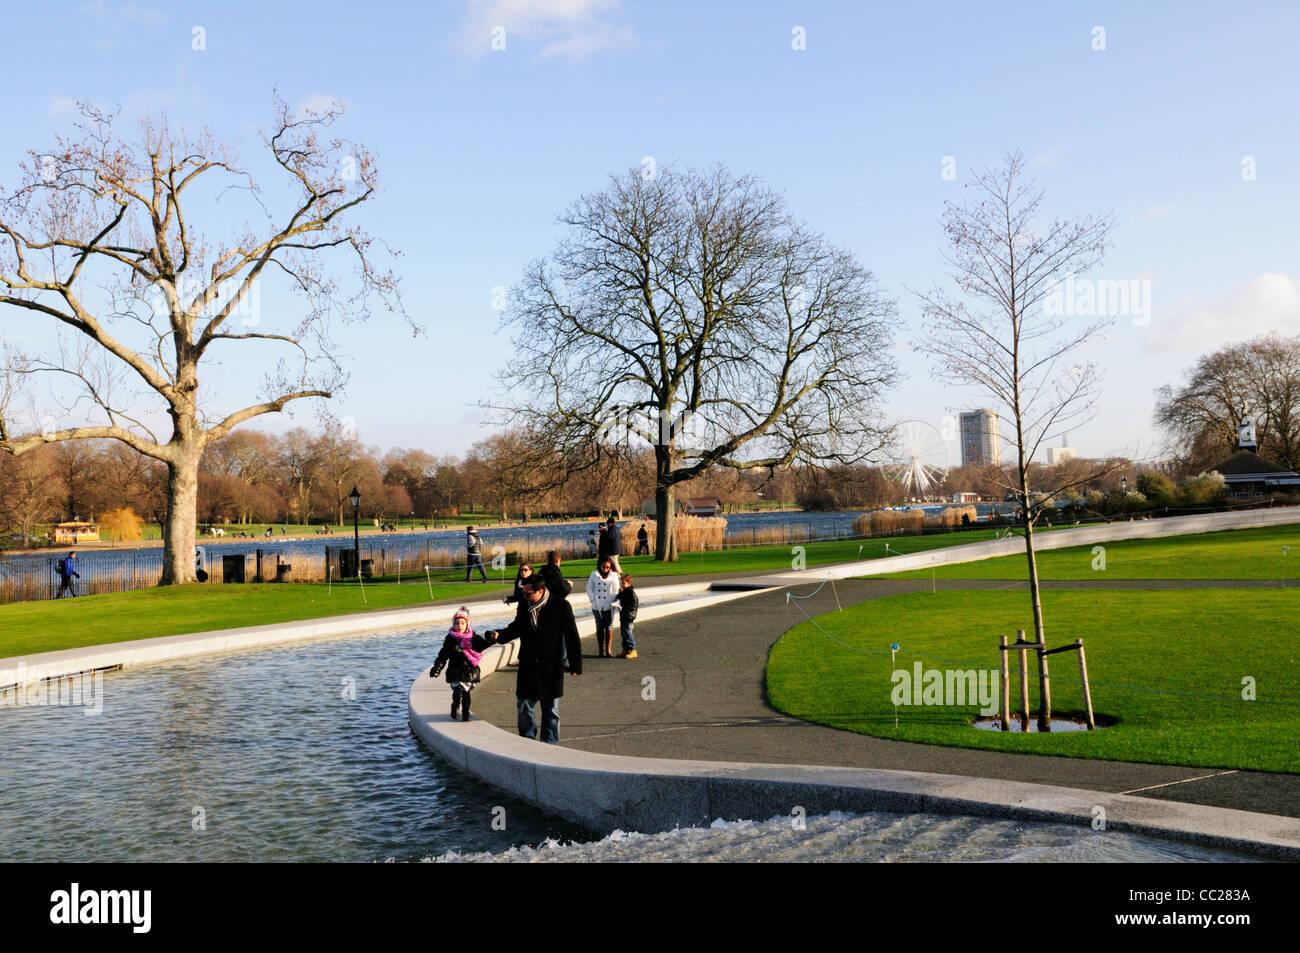 Princess Diana of Wales Memorial Fountain, Hyde Park, London, England, UK - Stock Image